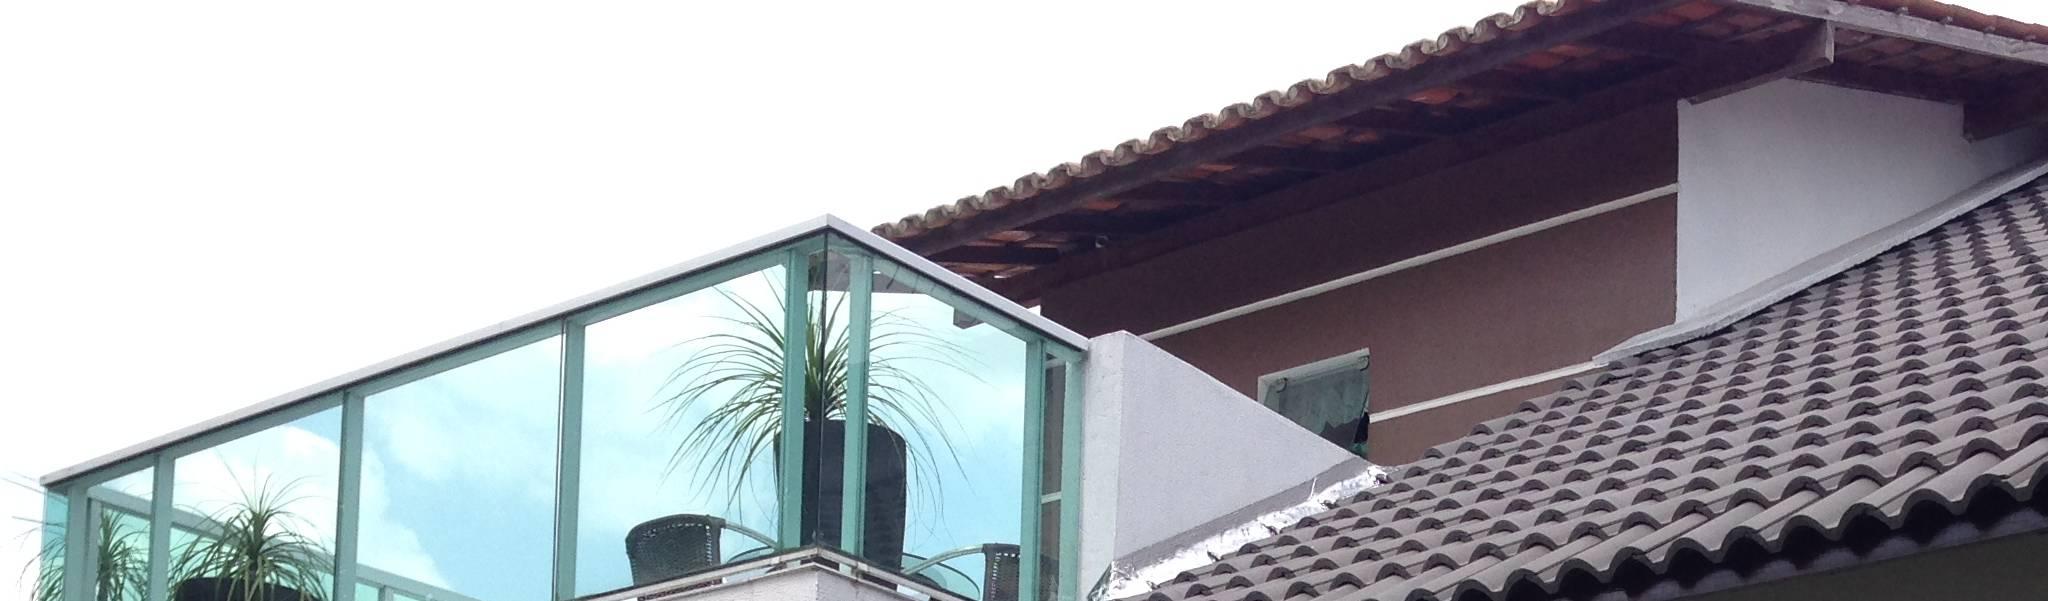 Marcos Assmar Arquitetura | Paisagismo